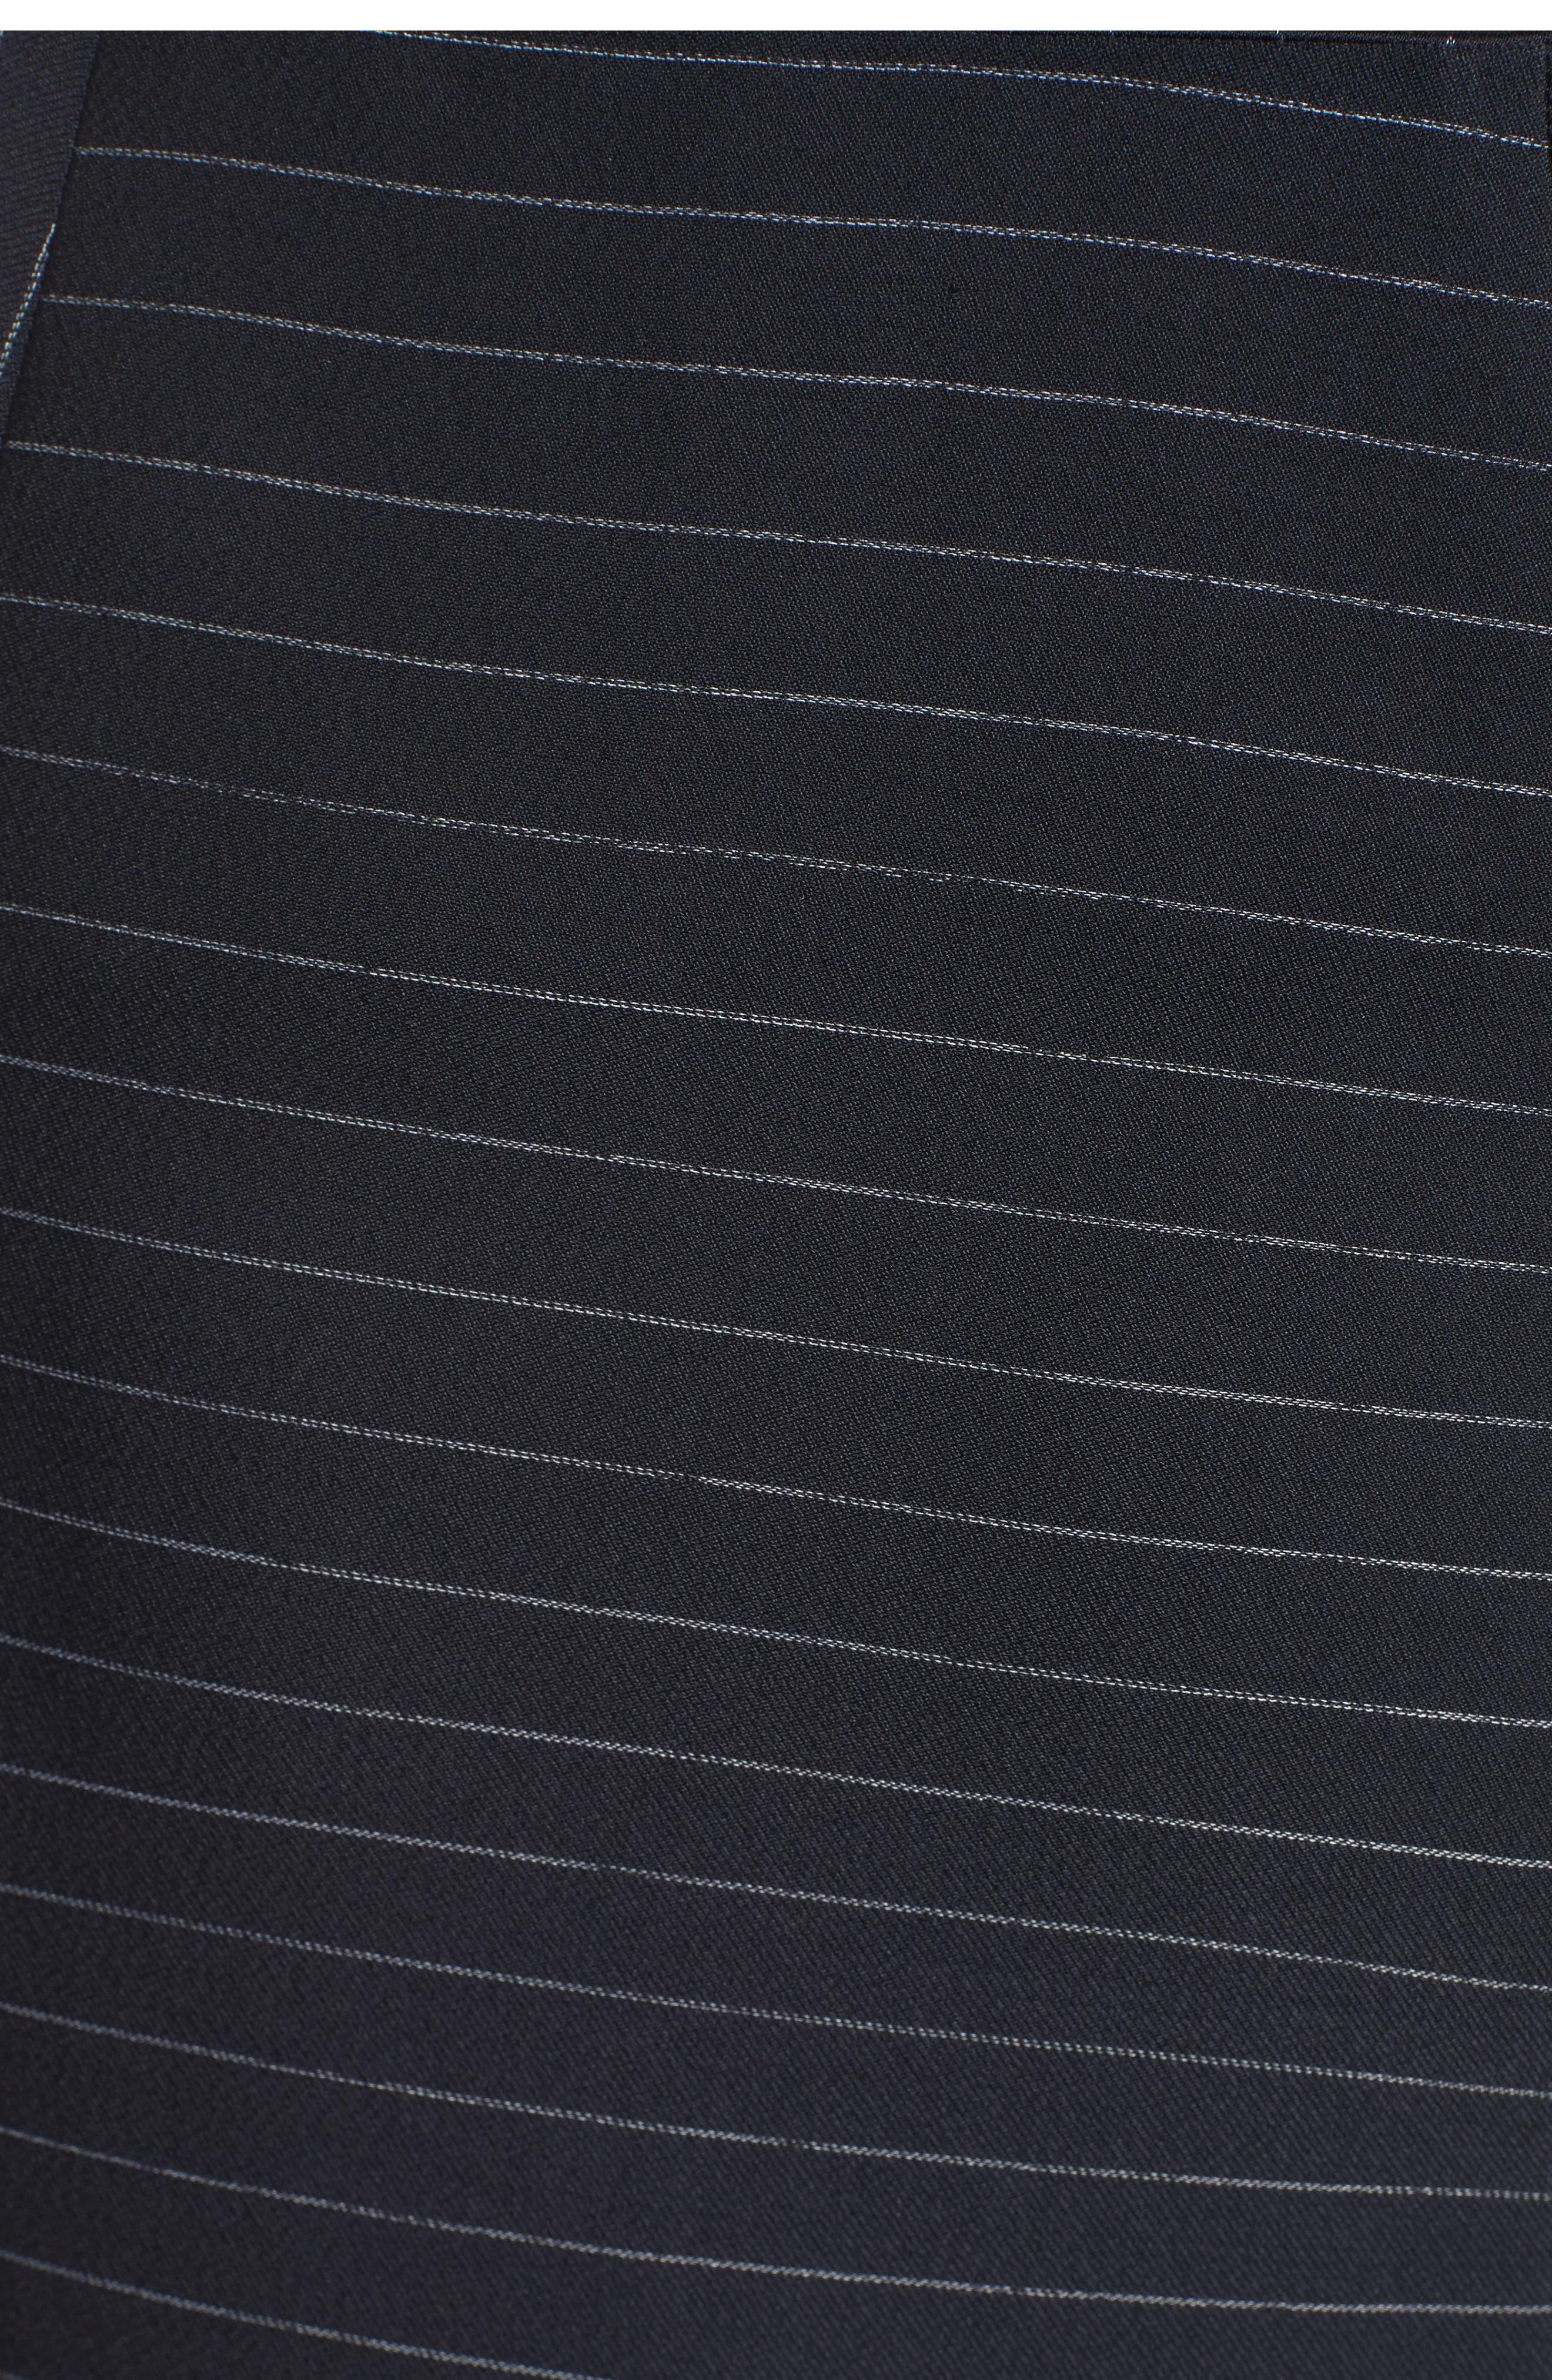 Alternate Image 3  - Jason Wu Pinstripe Stretch Asymmetrical Skirt